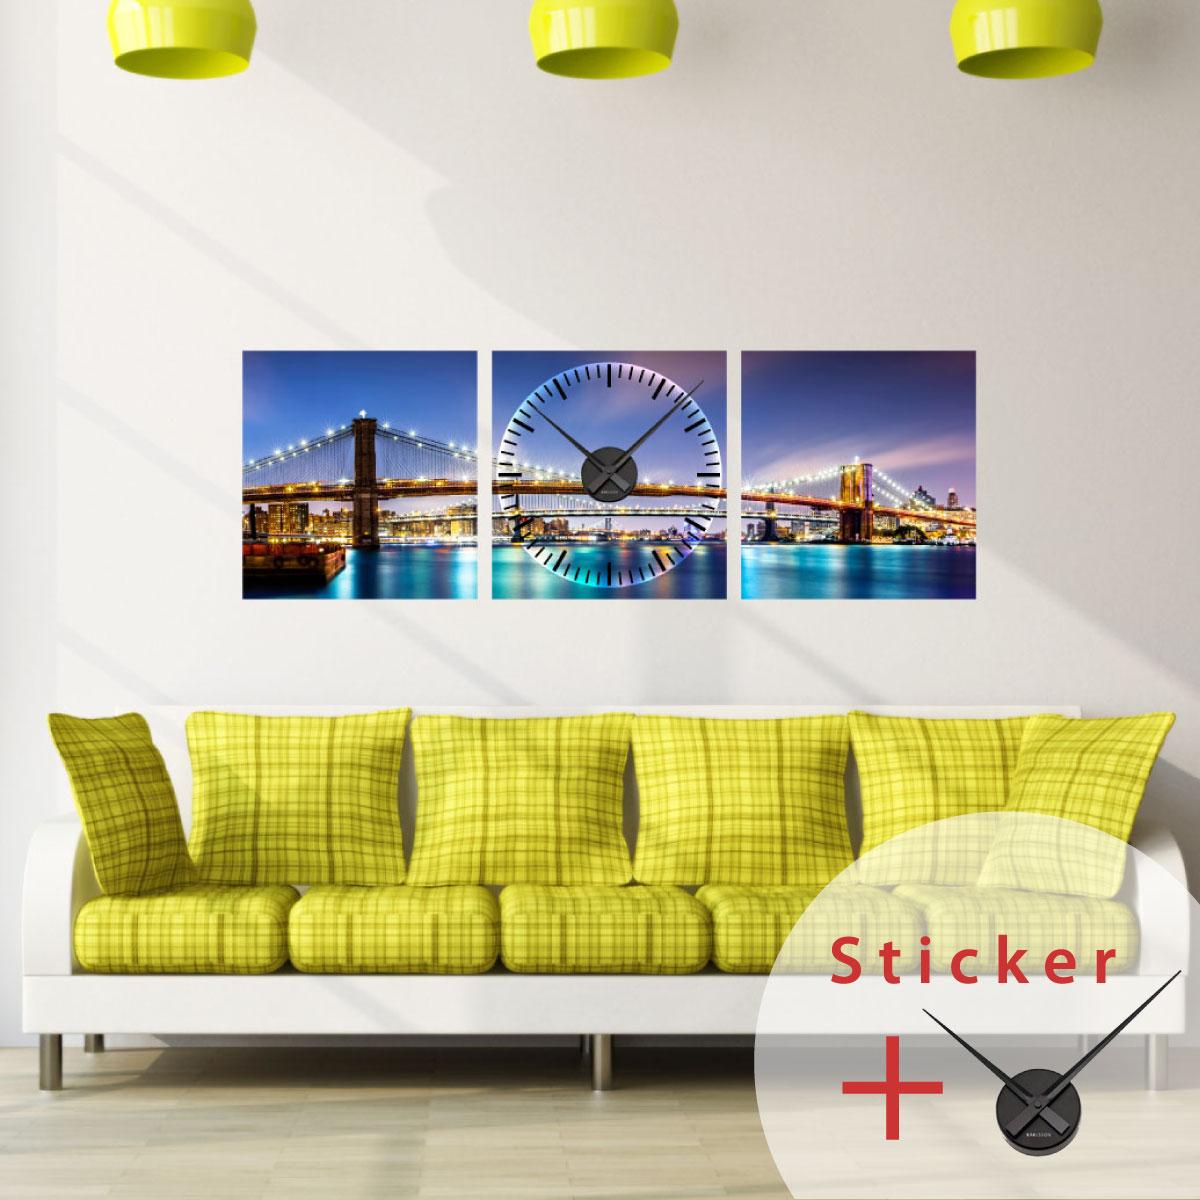 Sticker horloge vue sur brooklyn bridge sticker villes - Horloge murale design italien ...